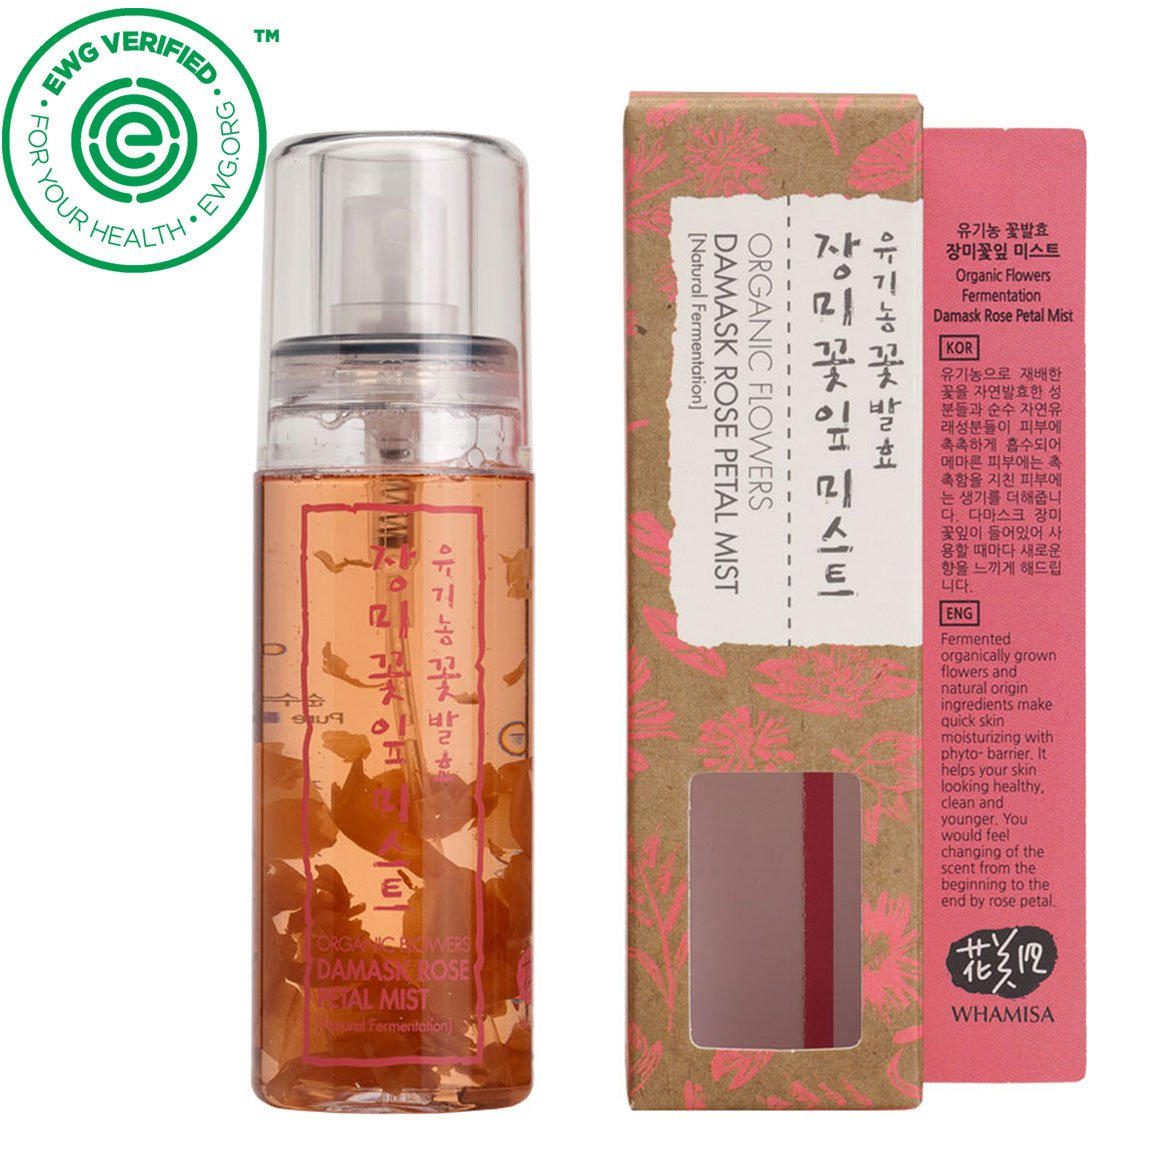 Whamisa Organic Flowers Damask Rose Petal Mist 2.71 fl. oz., Instant Refreshing Hydration - Naturally fermented, EWG Verified